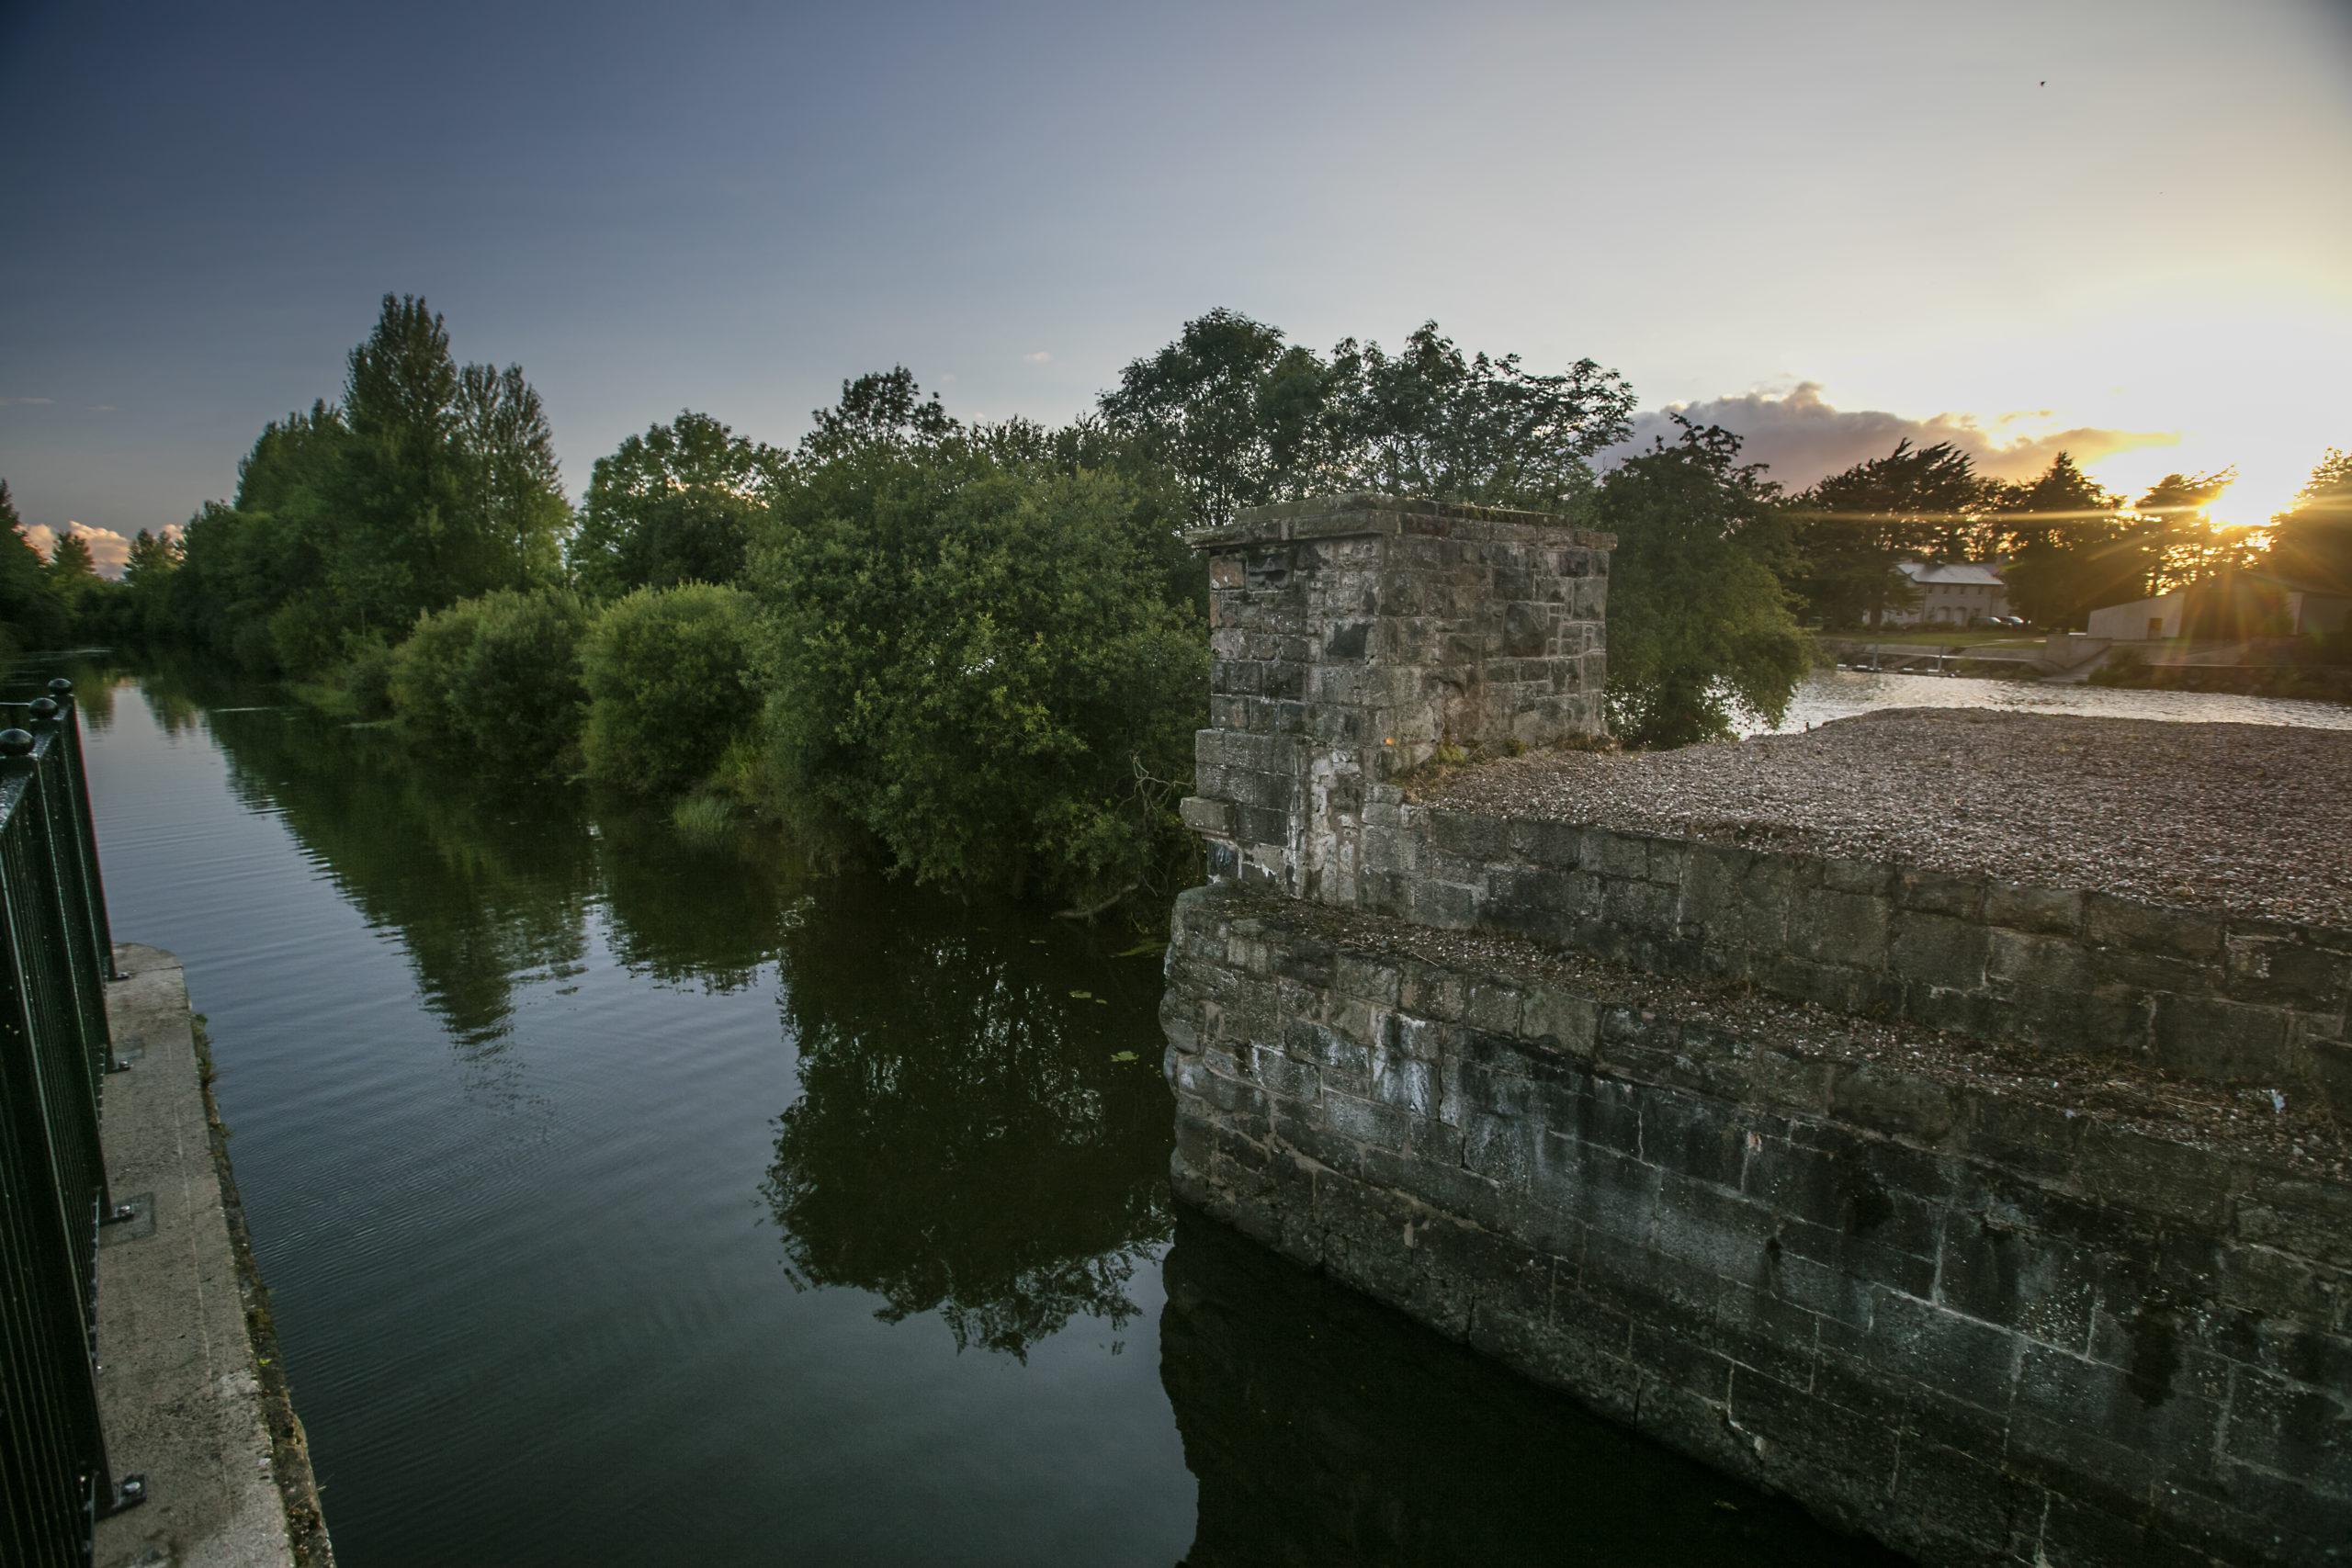 Kreuzfahrt auf dem River Shannon